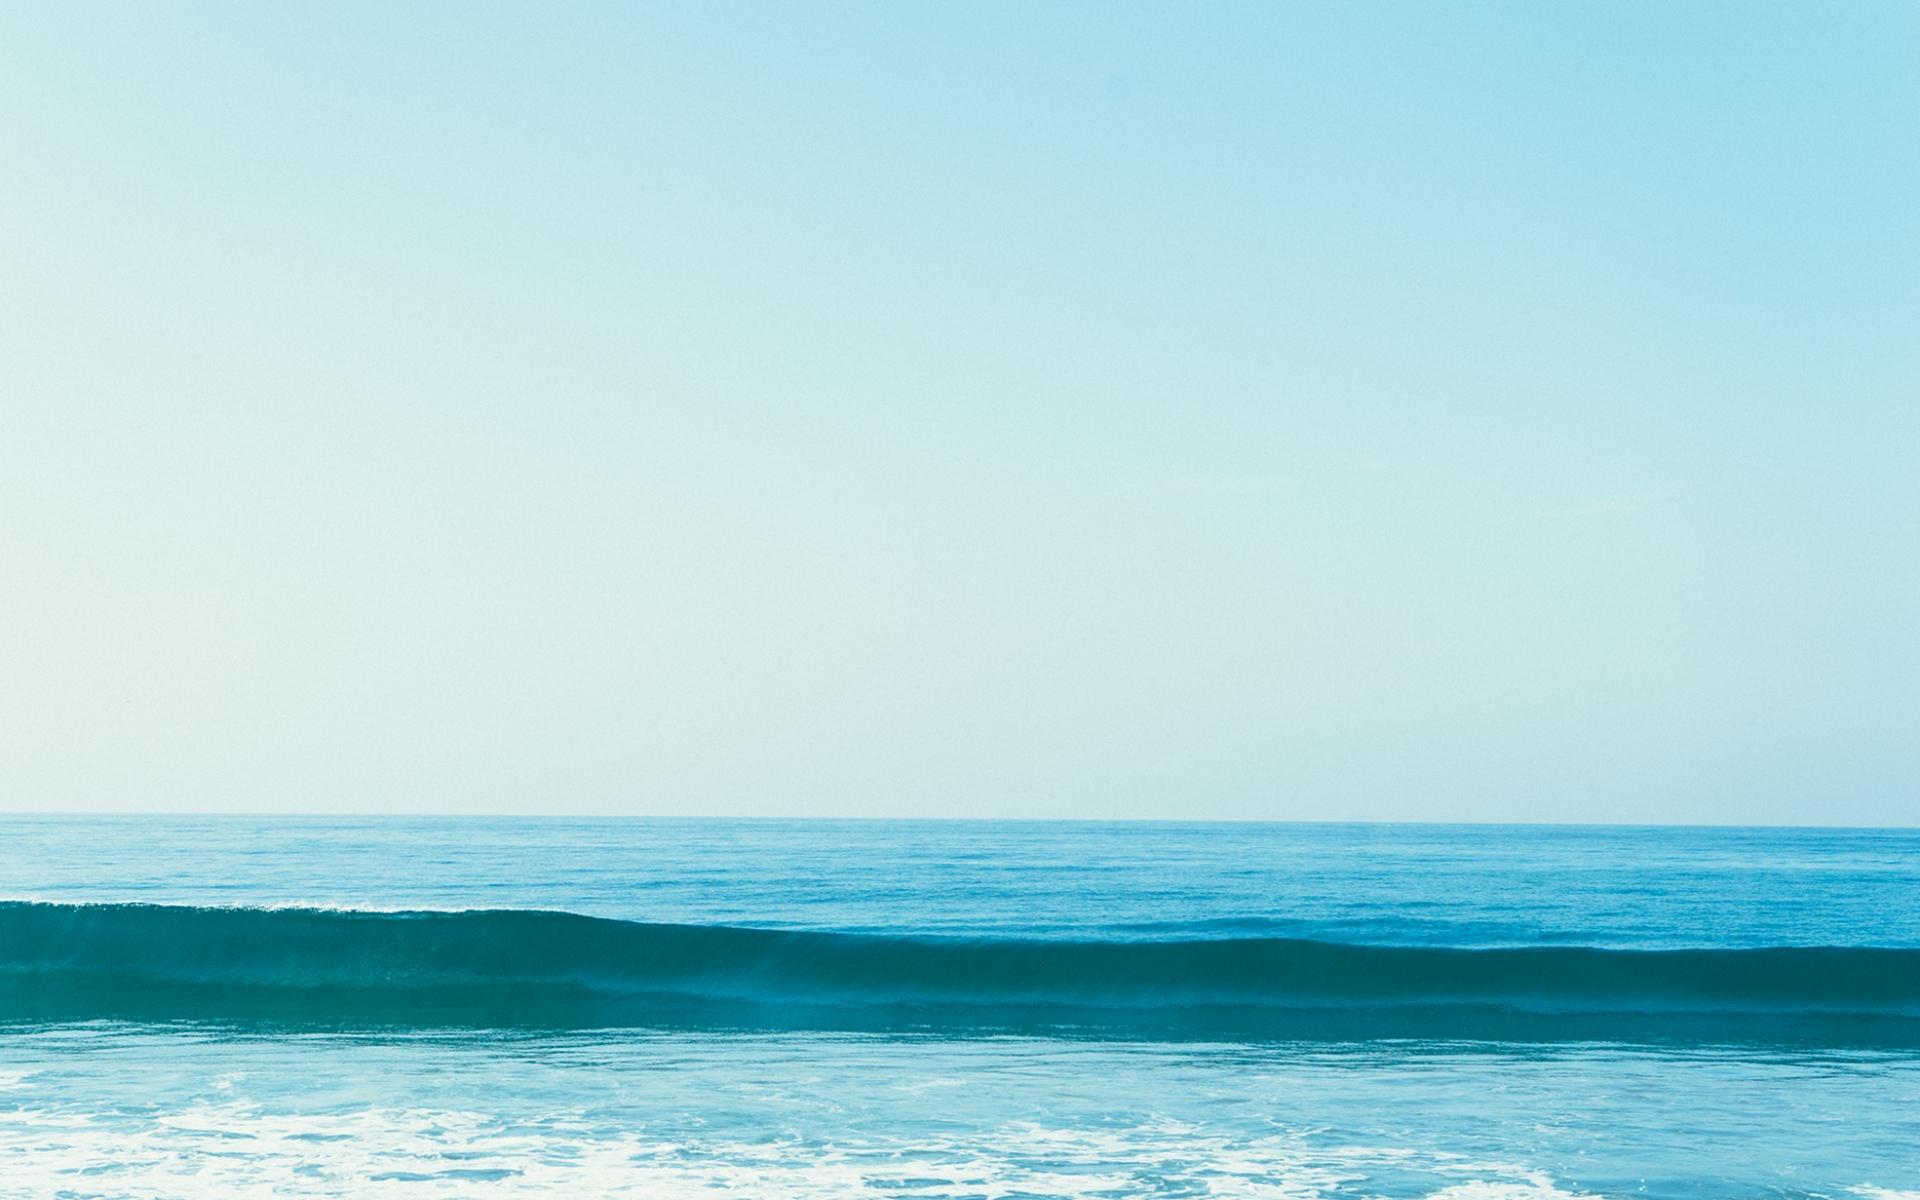 природа море горизонт небо берег без смс